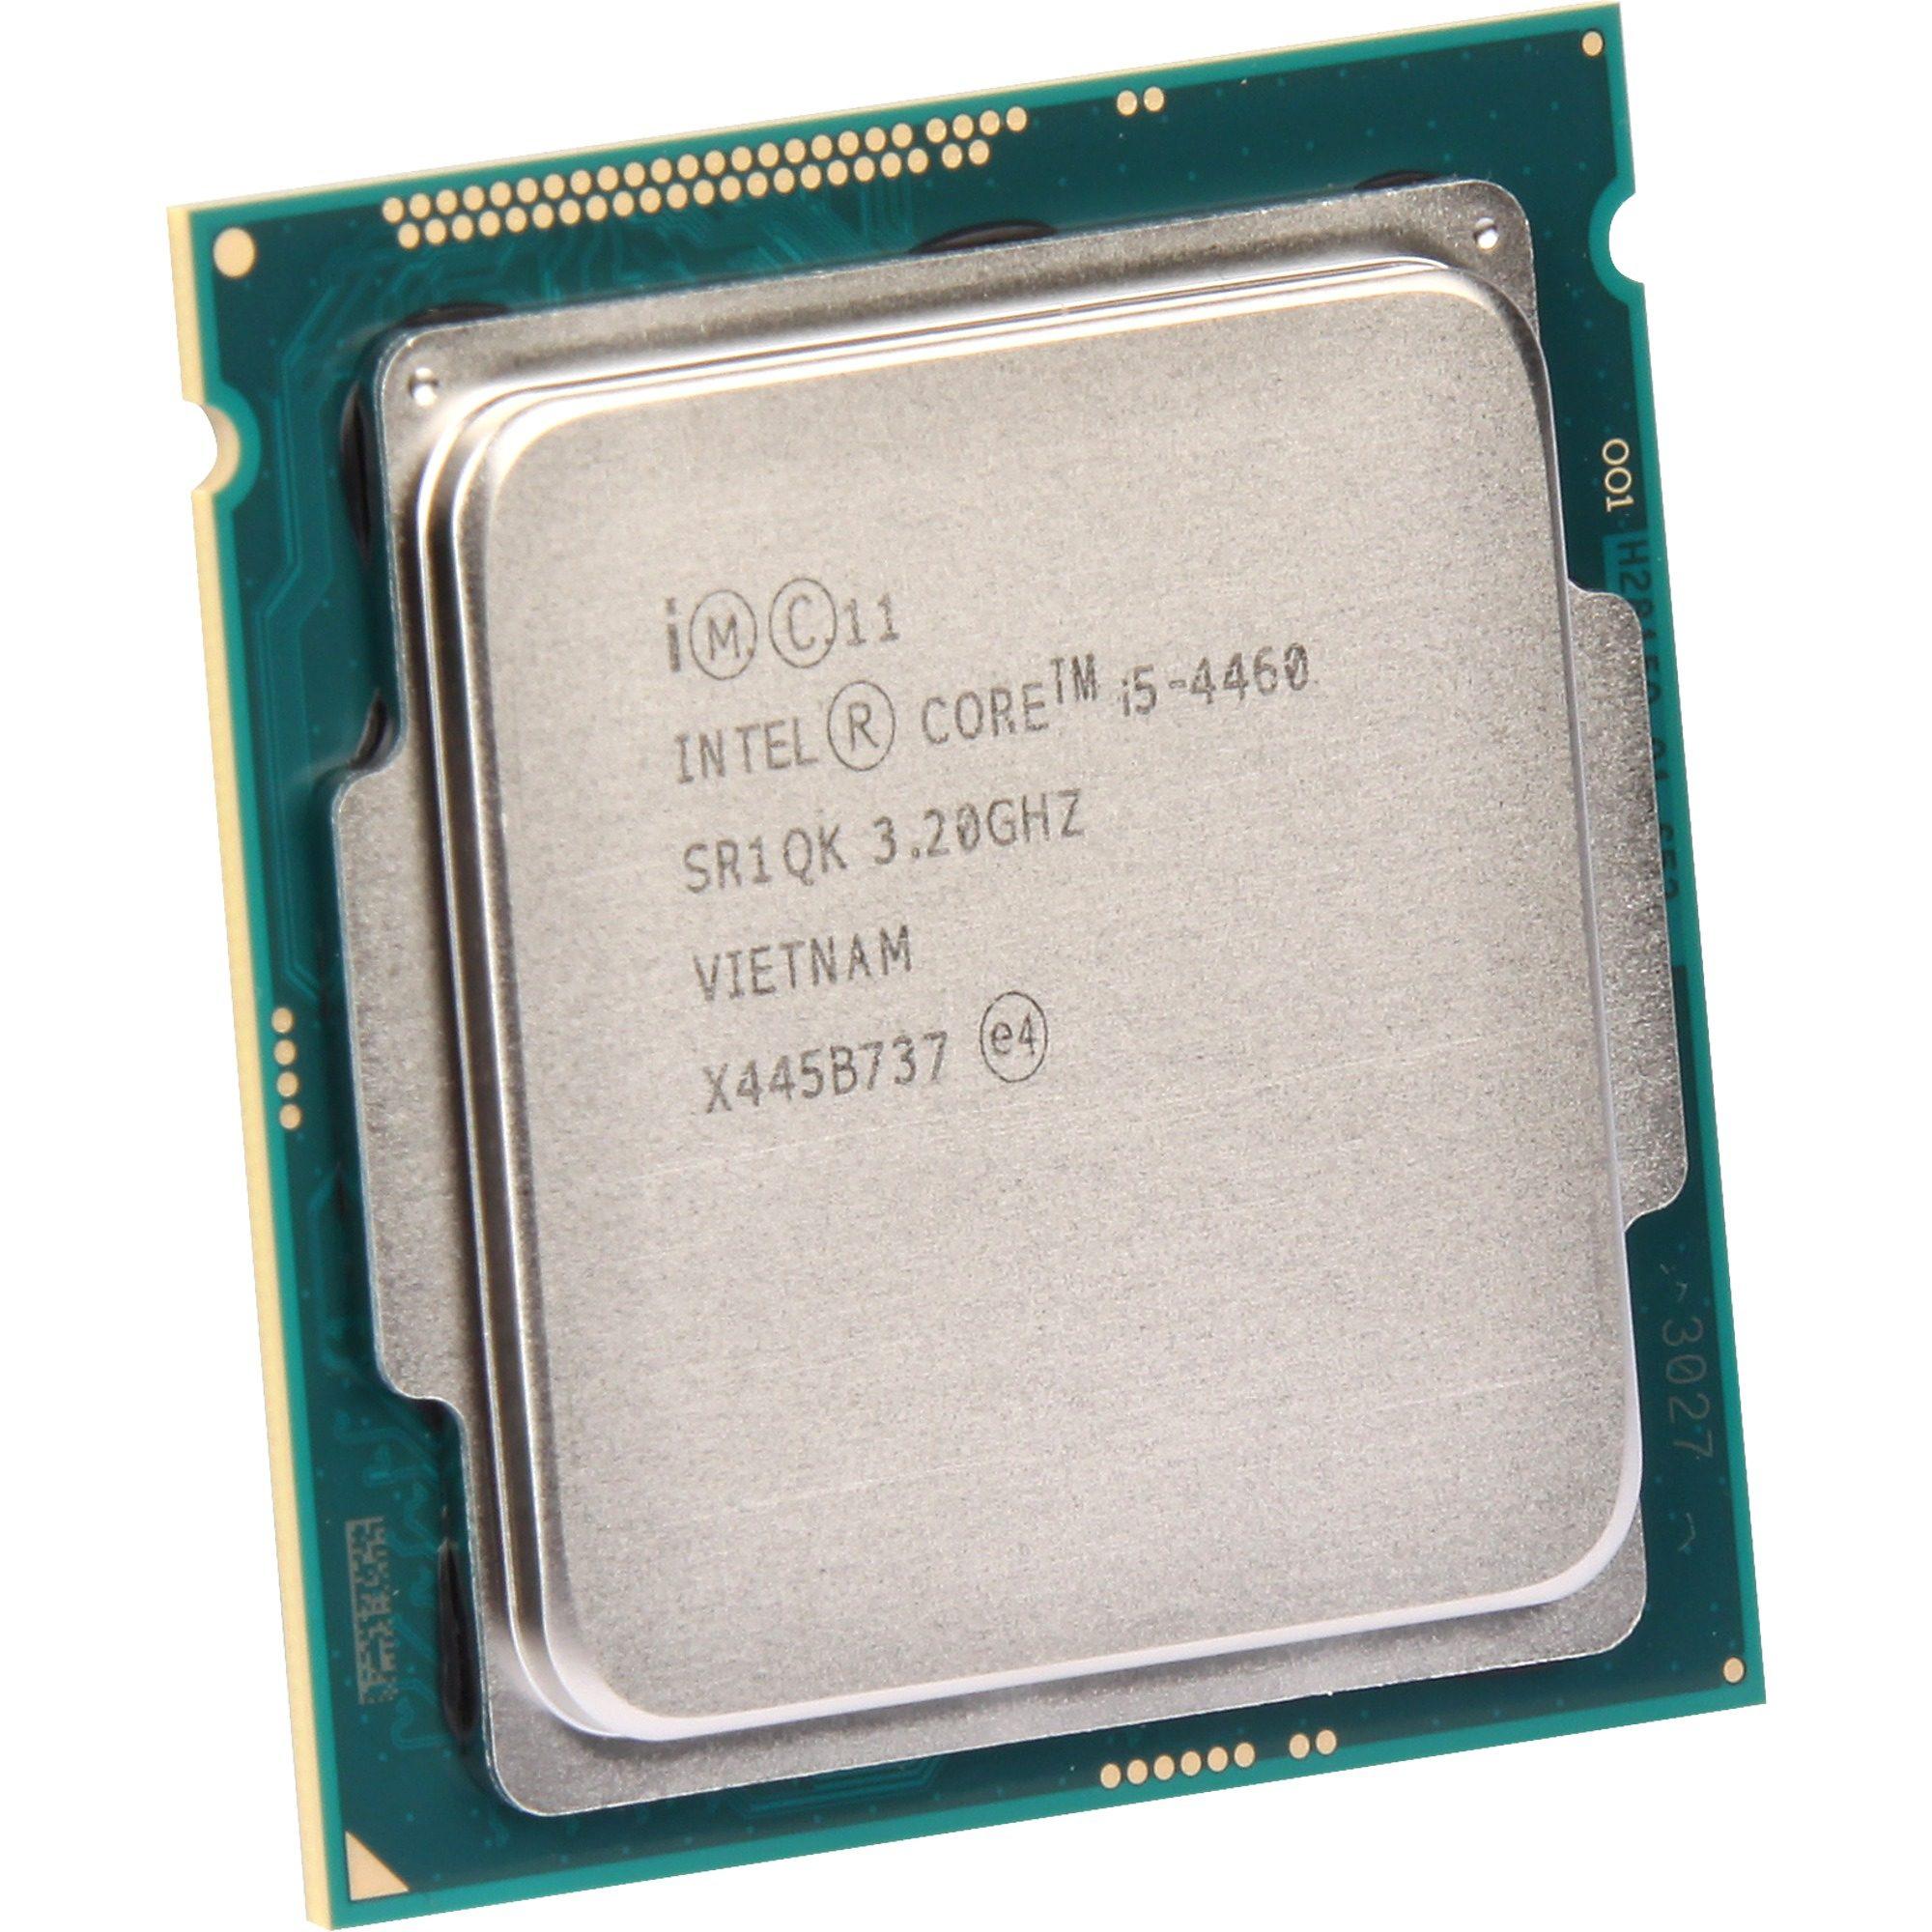 Intel® Prozessor »Core(TM) i5-4460«